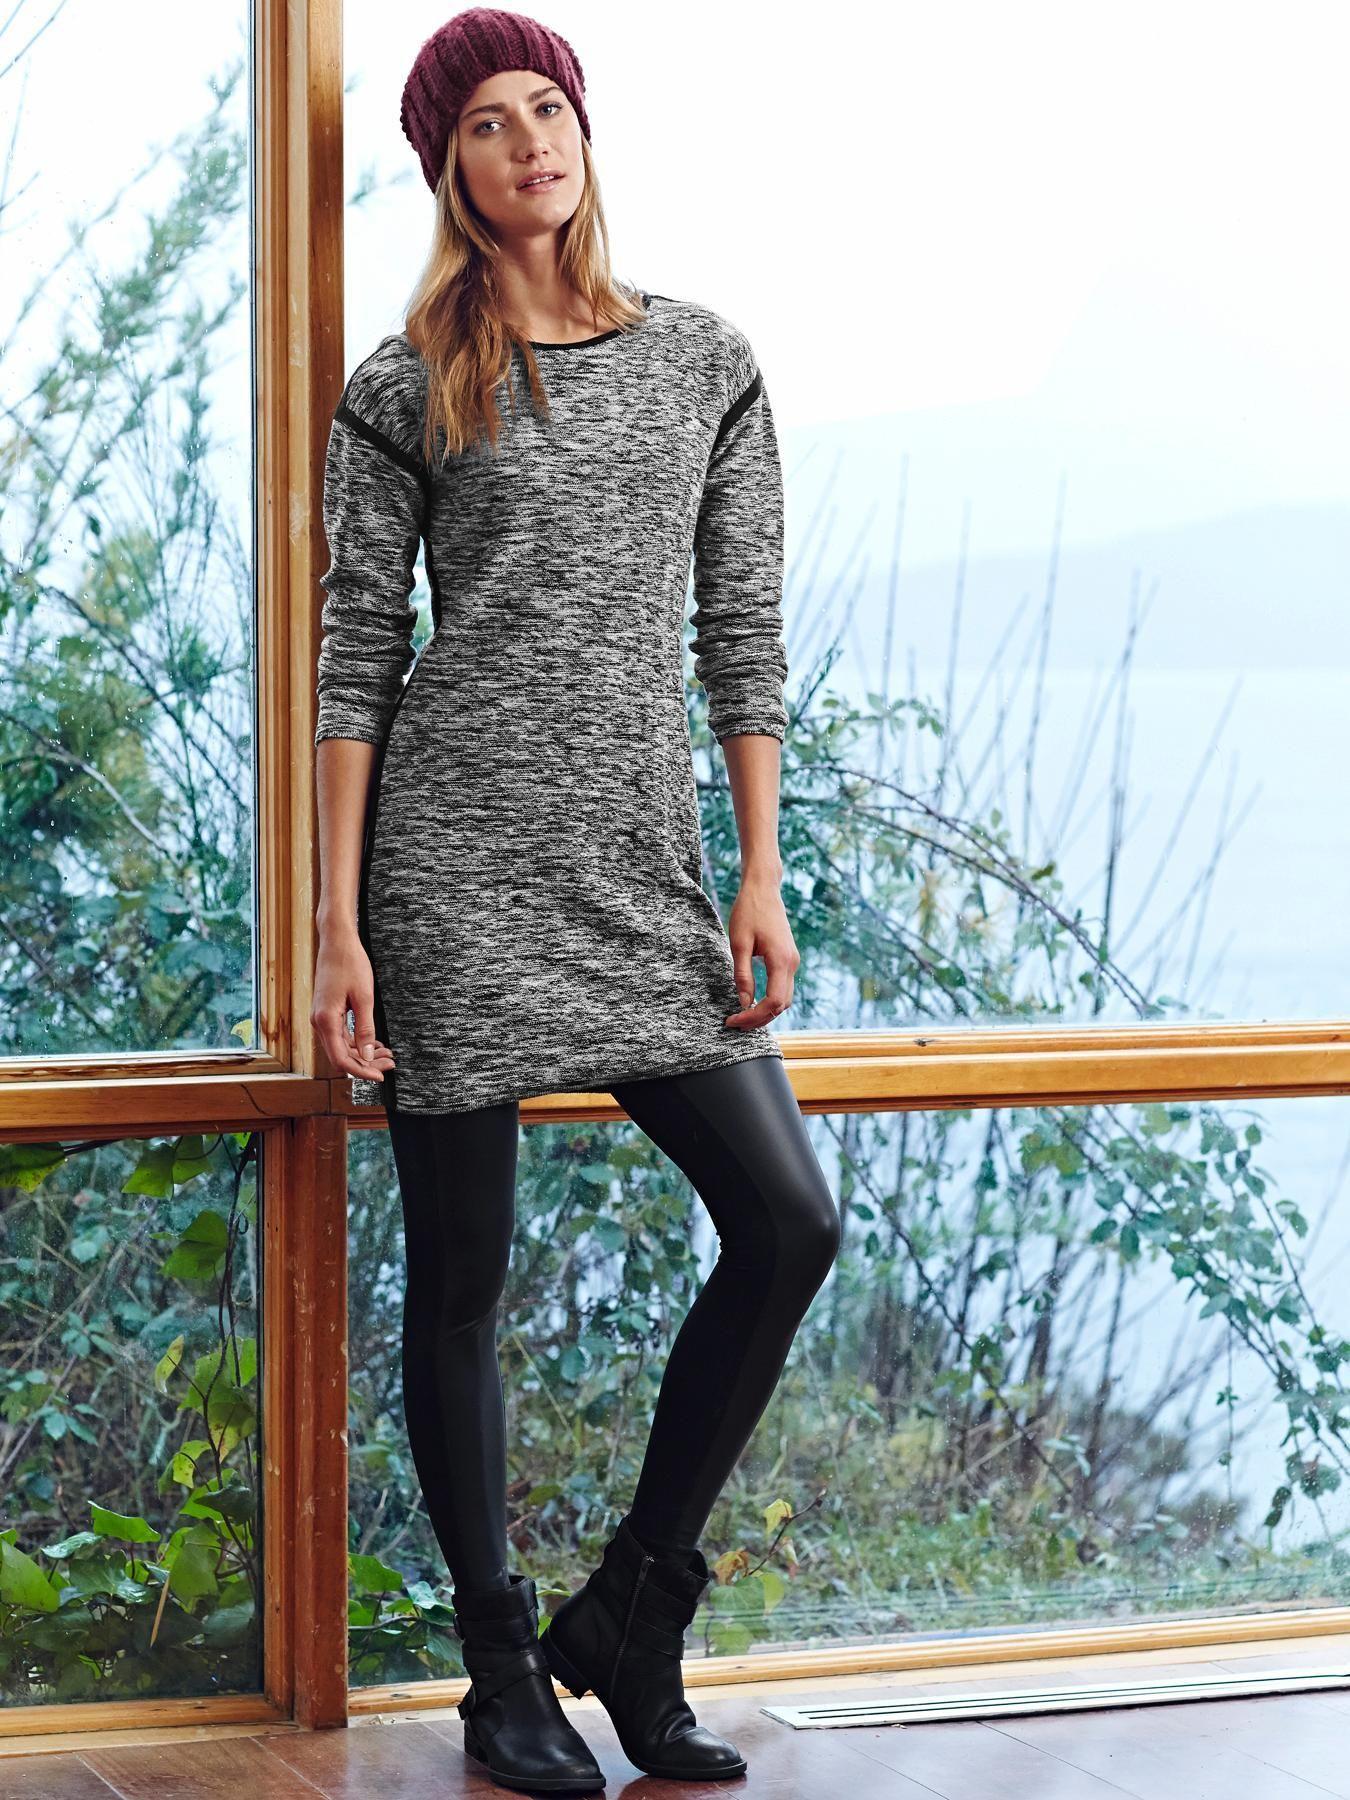 Women S Grey Sweater Dress Black Leather Leggings Black Leather Ankle Boots Burgundy Beanie Black Leather Leggings Sweater Dress Womens Yoga Clothes [ 1800 x 1350 Pixel ]